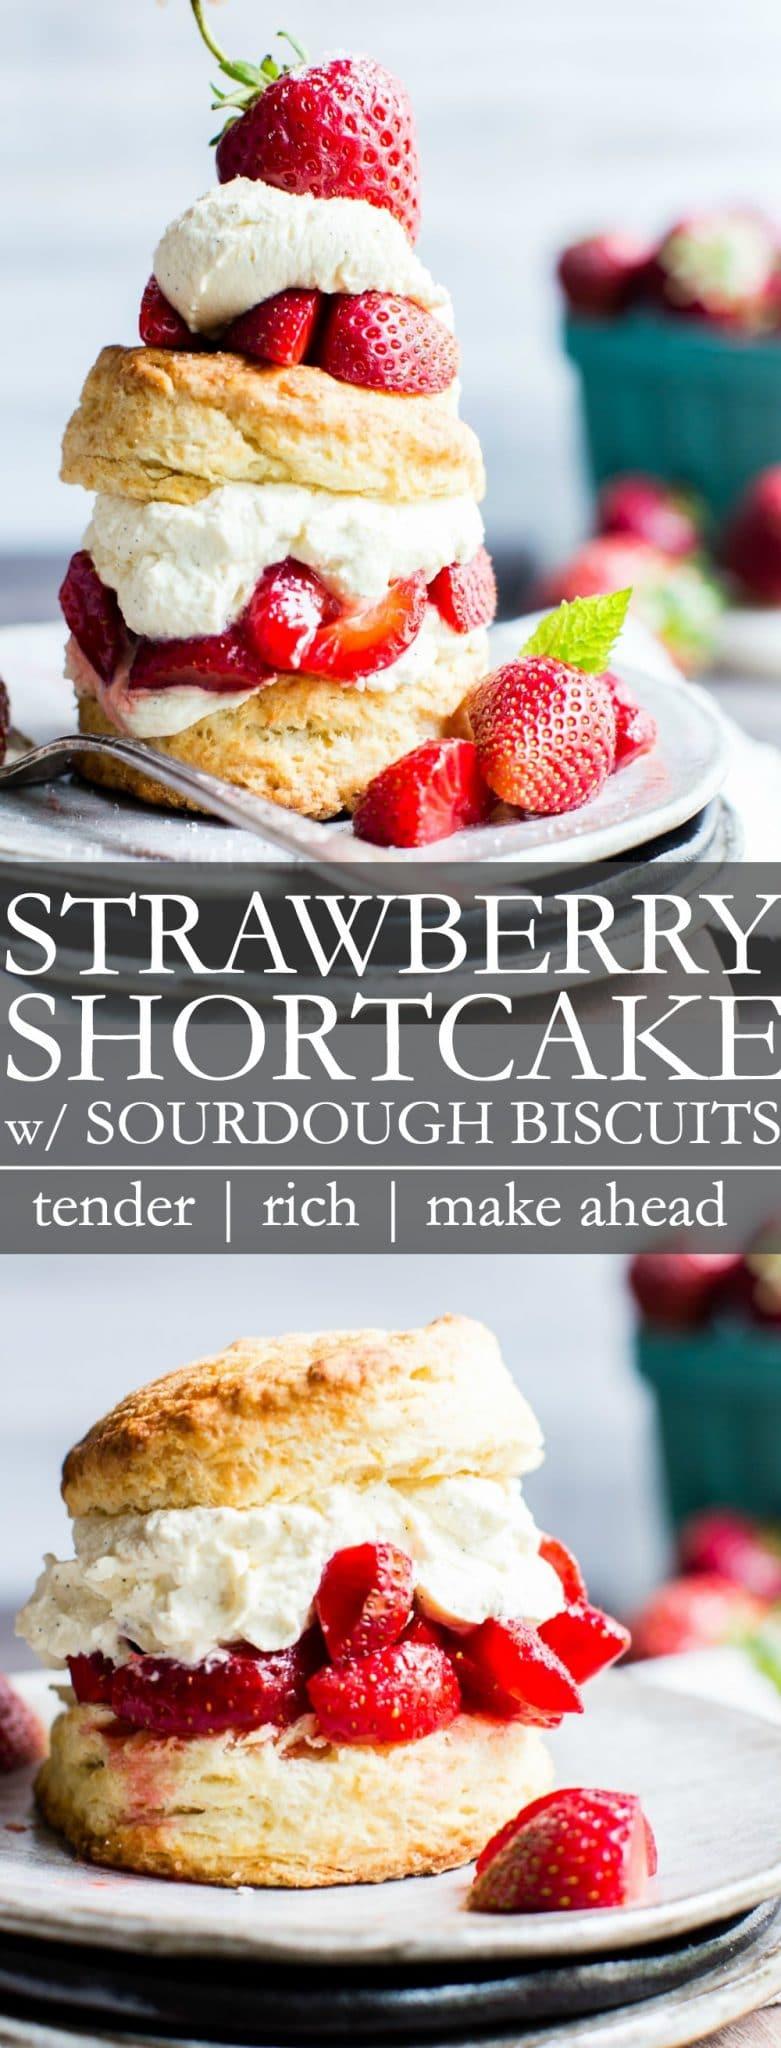 Strawberry Shortcake Pin for Pinterest